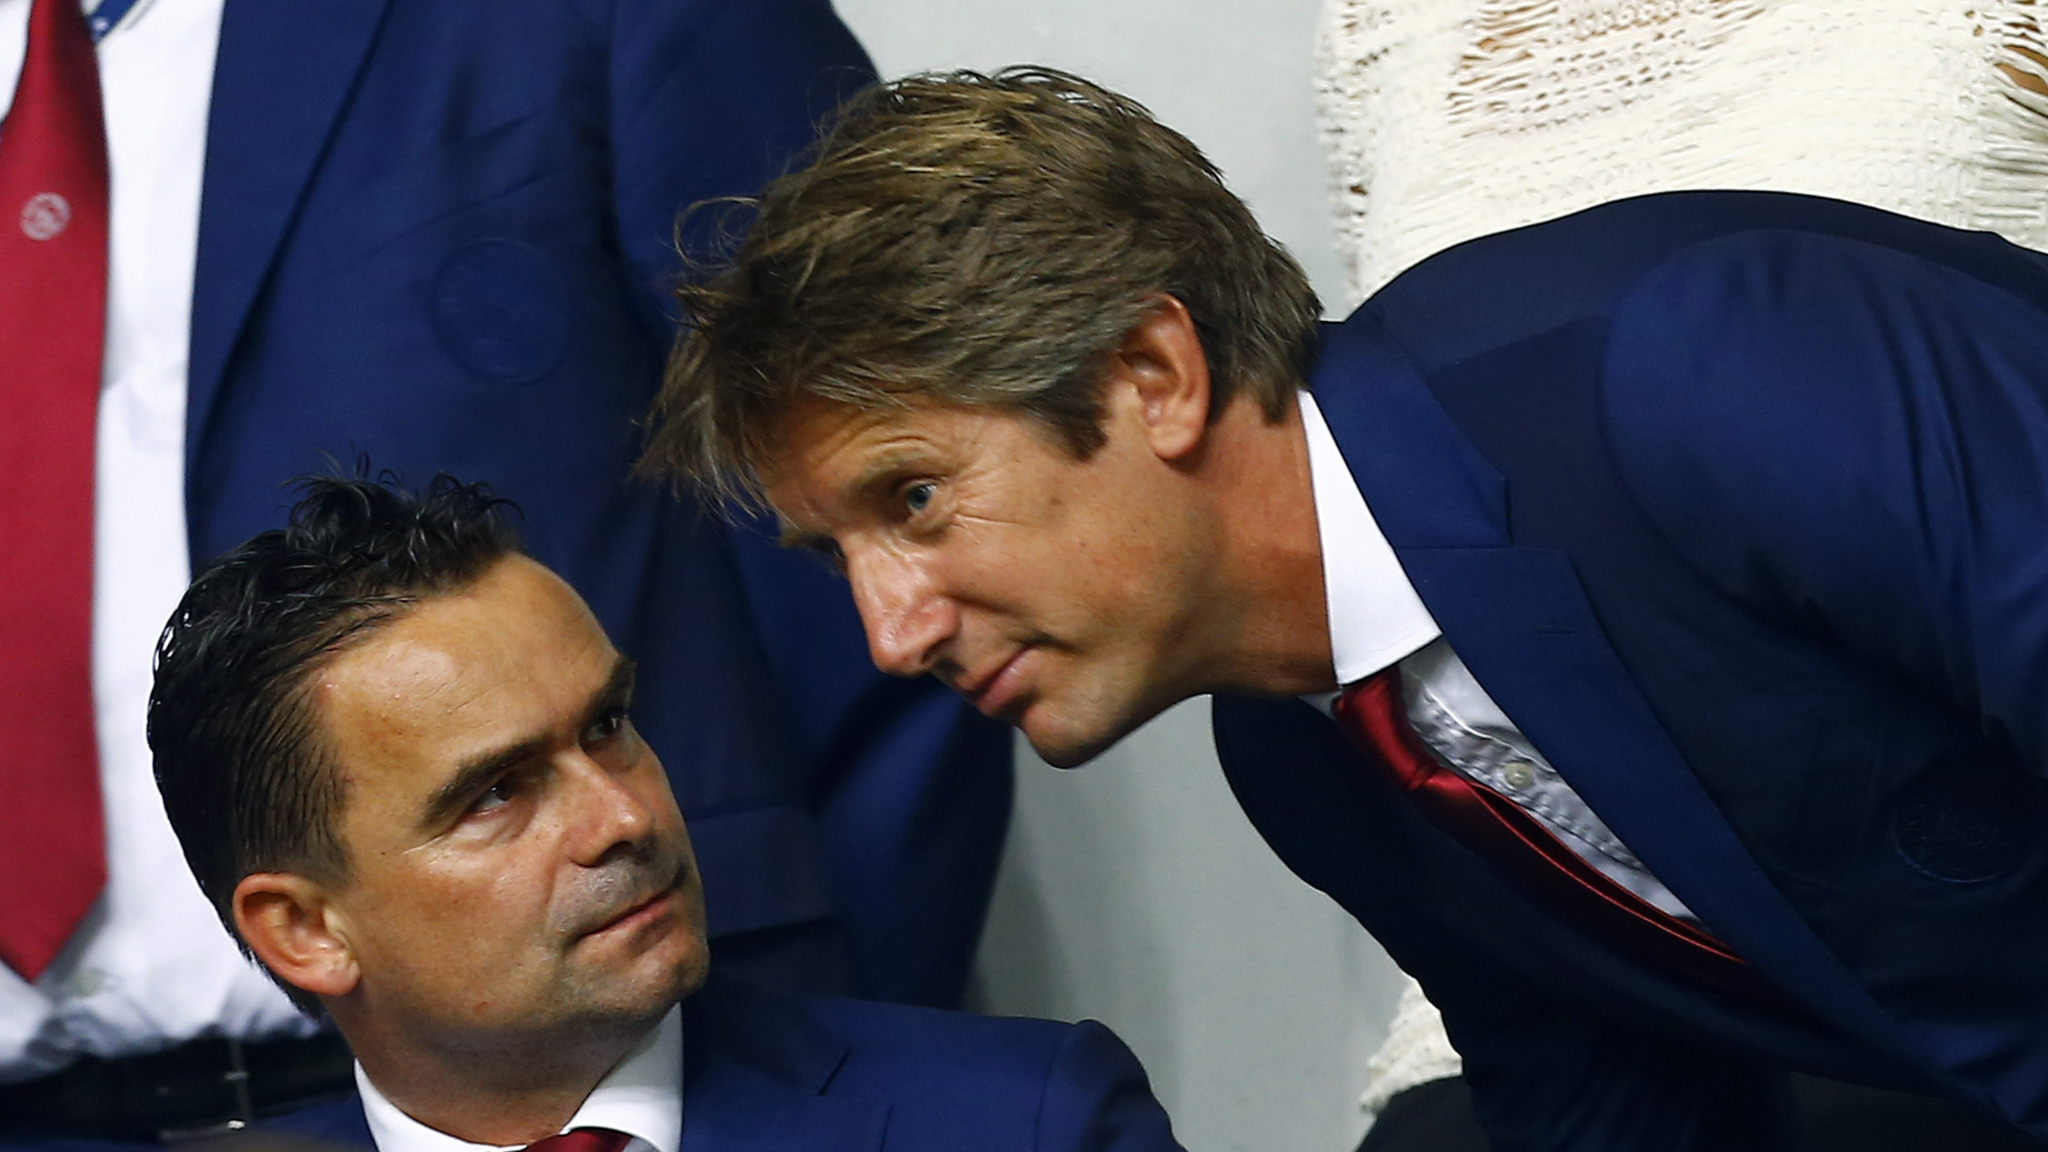 Ajax legends Marc Overmars (left) and Edwin Van Der Sar: kingmakers at the Johan Cruyff Arena